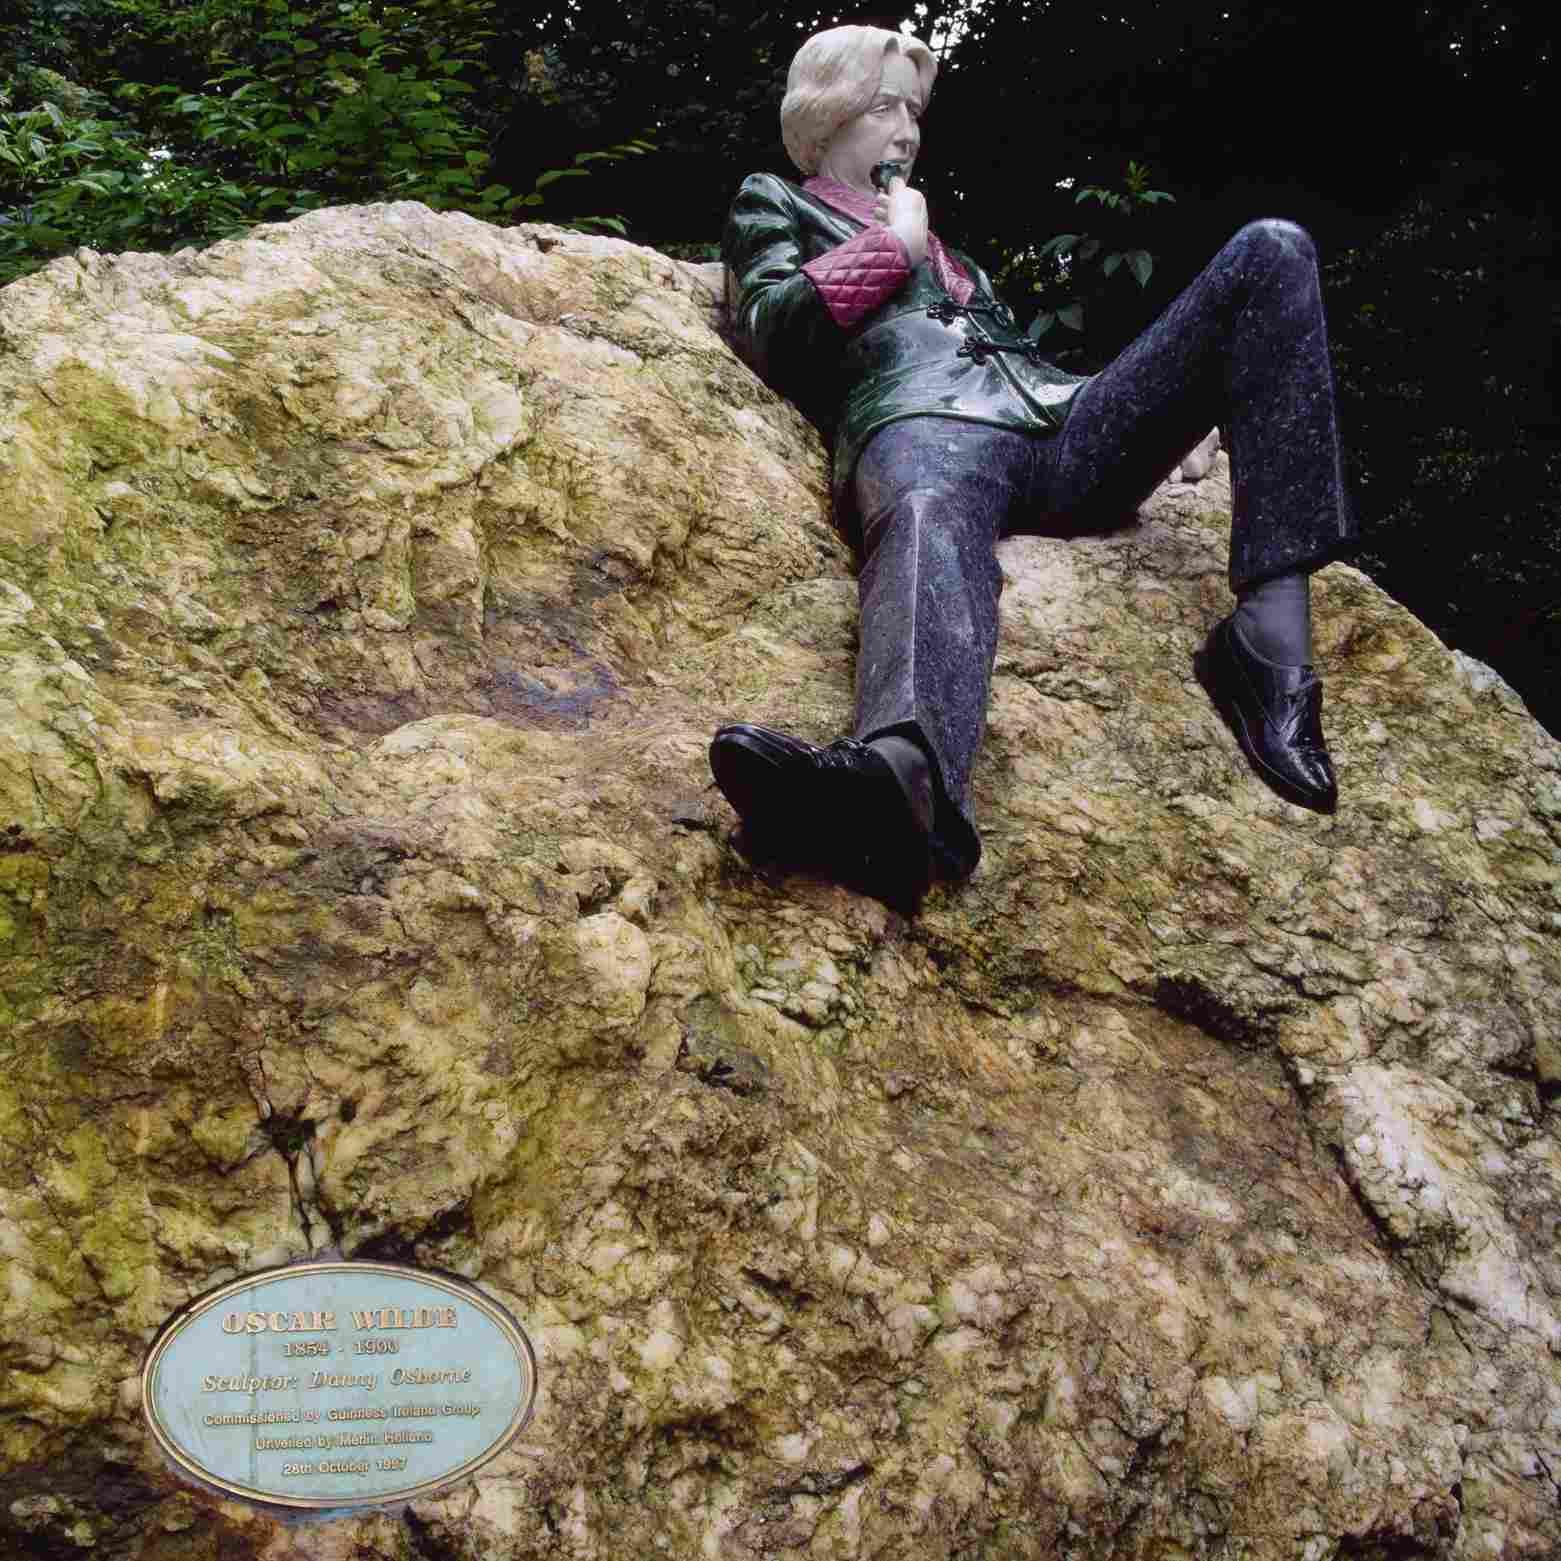 Oscar Wilde Memorial in Merrion Square